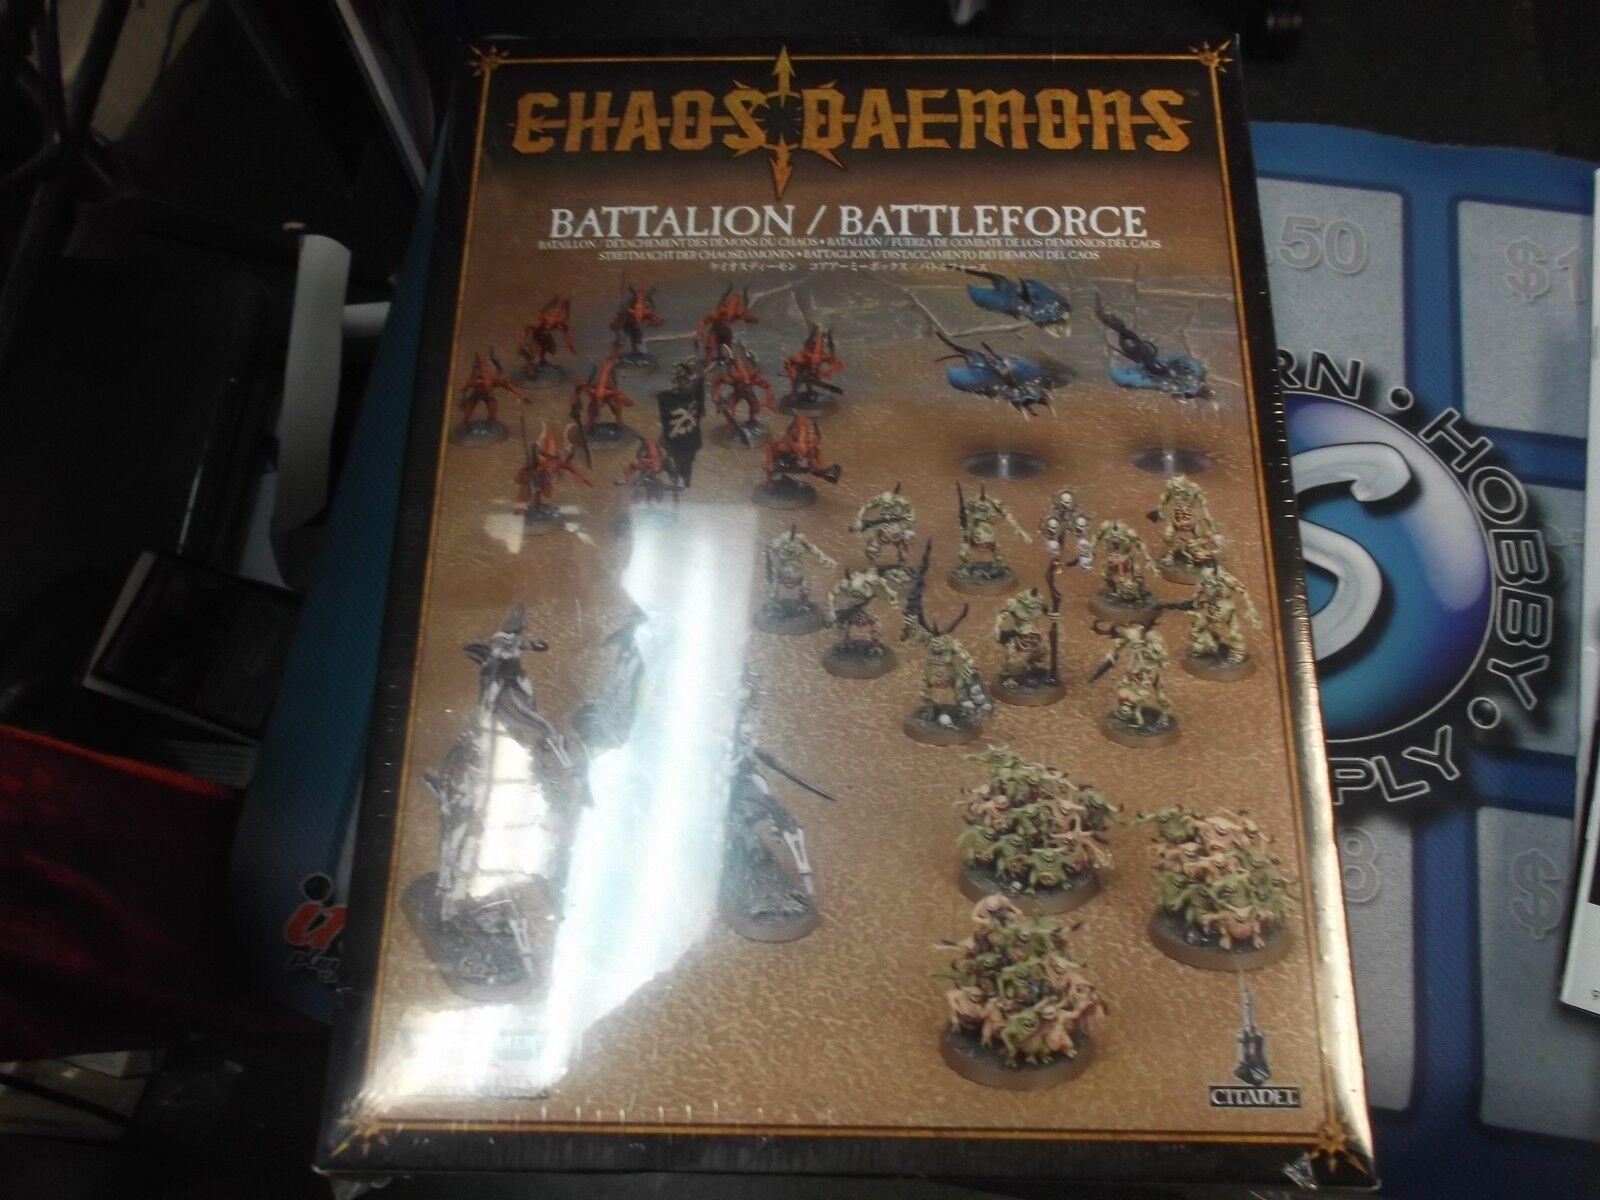 Bataljon Chaos Daemon slåsspoce  bataljon 2012 Warhammer 40k spelverkstad NY SEALD